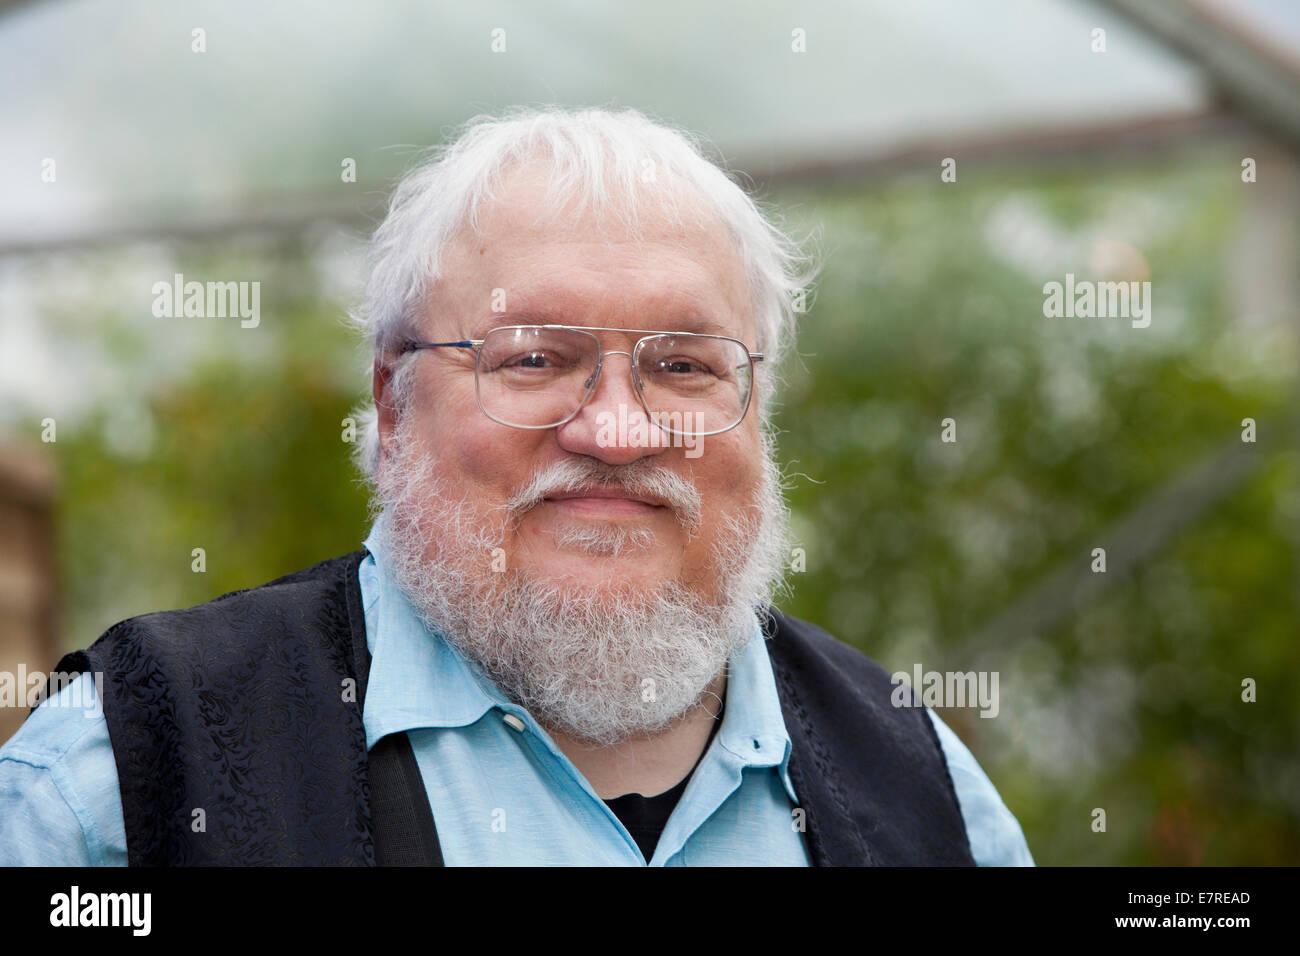 George R.R. Martin, 'Game of Thrones' author, at the Edinburgh International Book Festival 2014. Edinburgh, - Stock Image